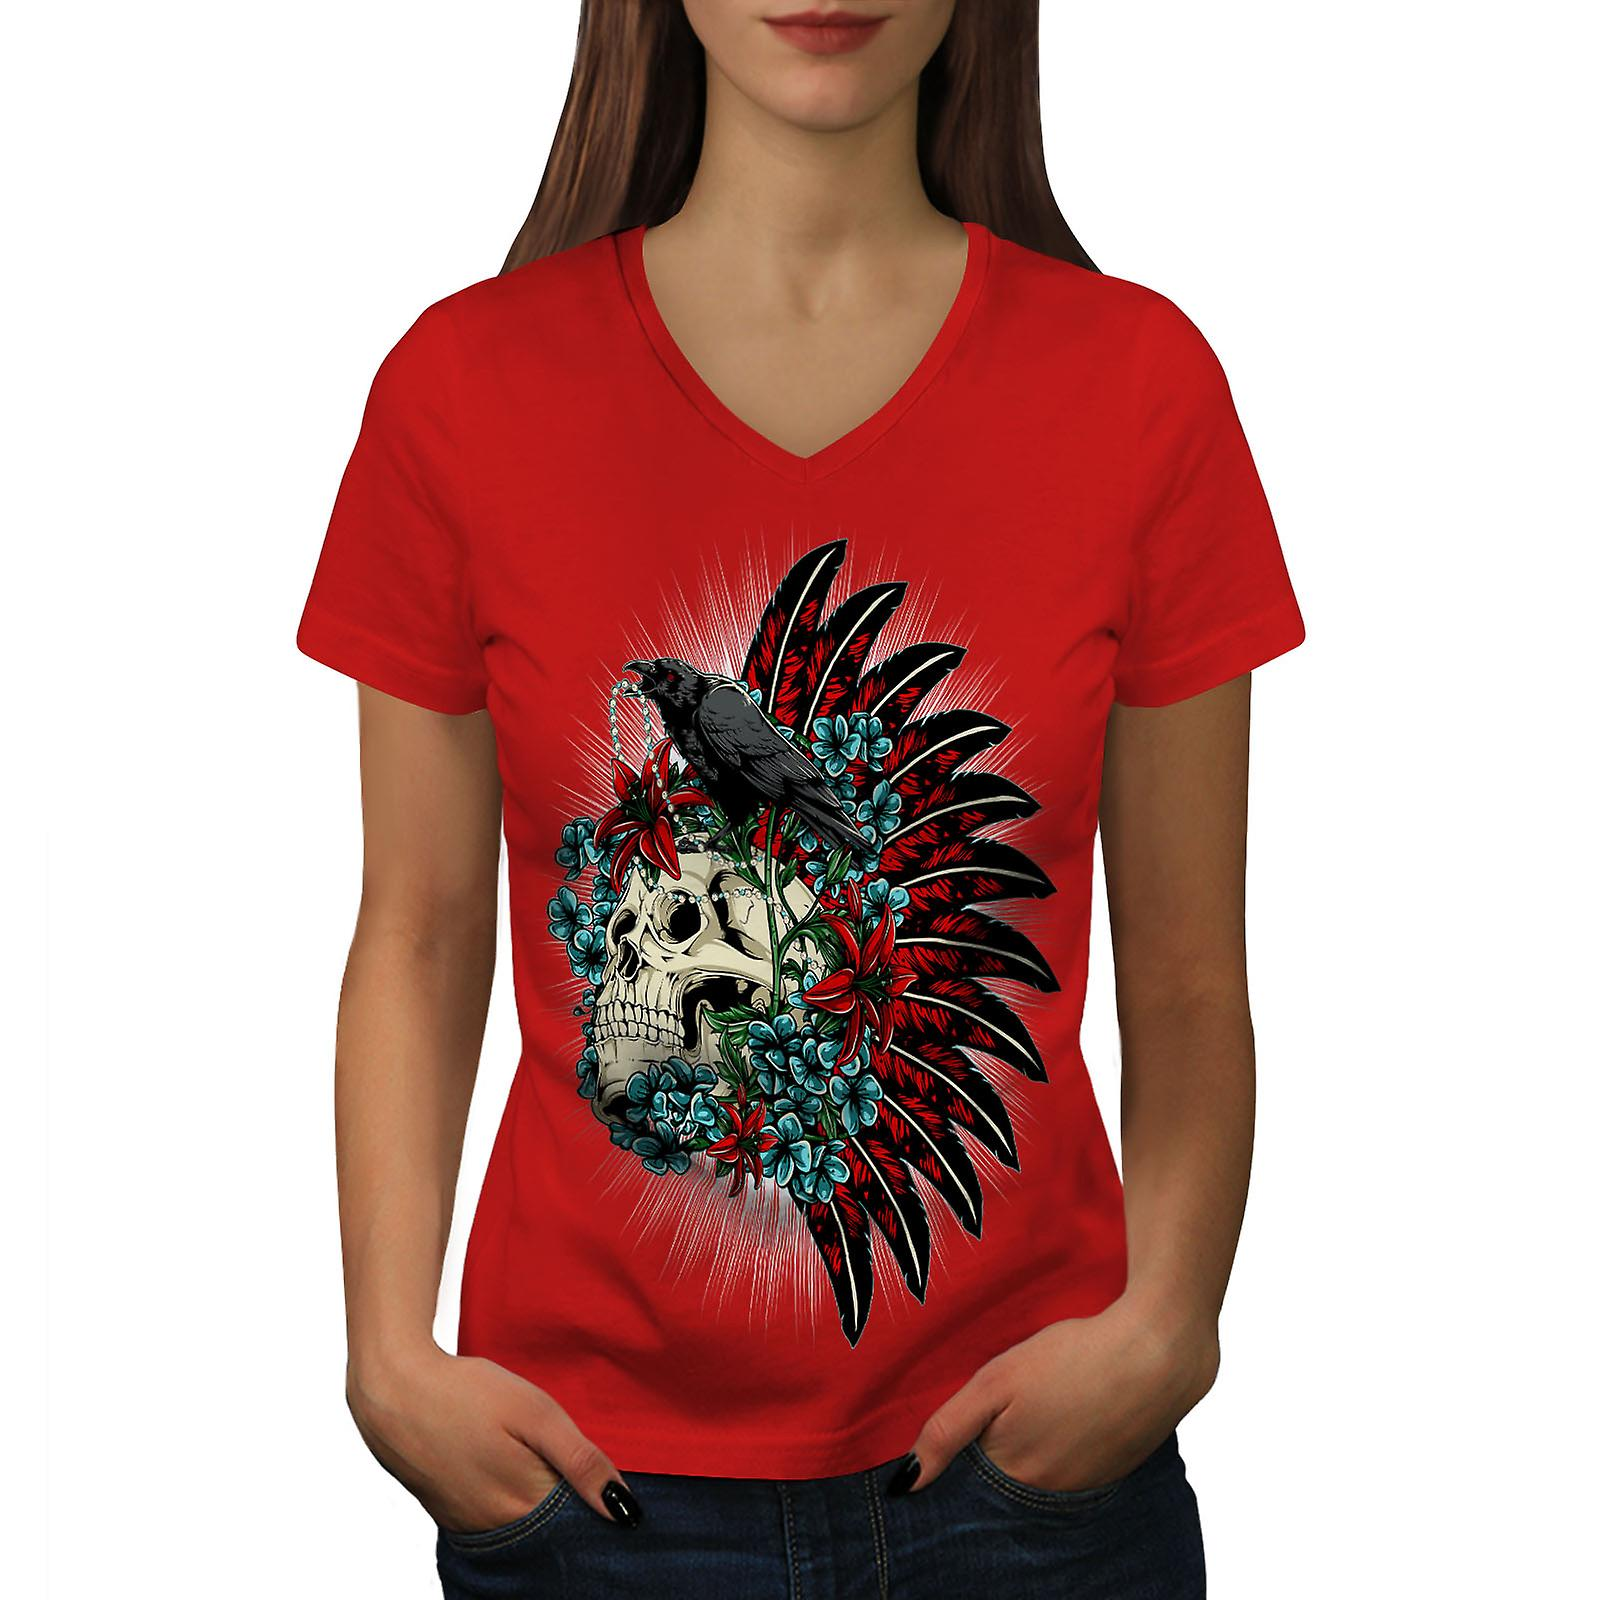 Crâne Corbeau mort fantaisie femmes RedV-Neck T-shirt | Wellcoda